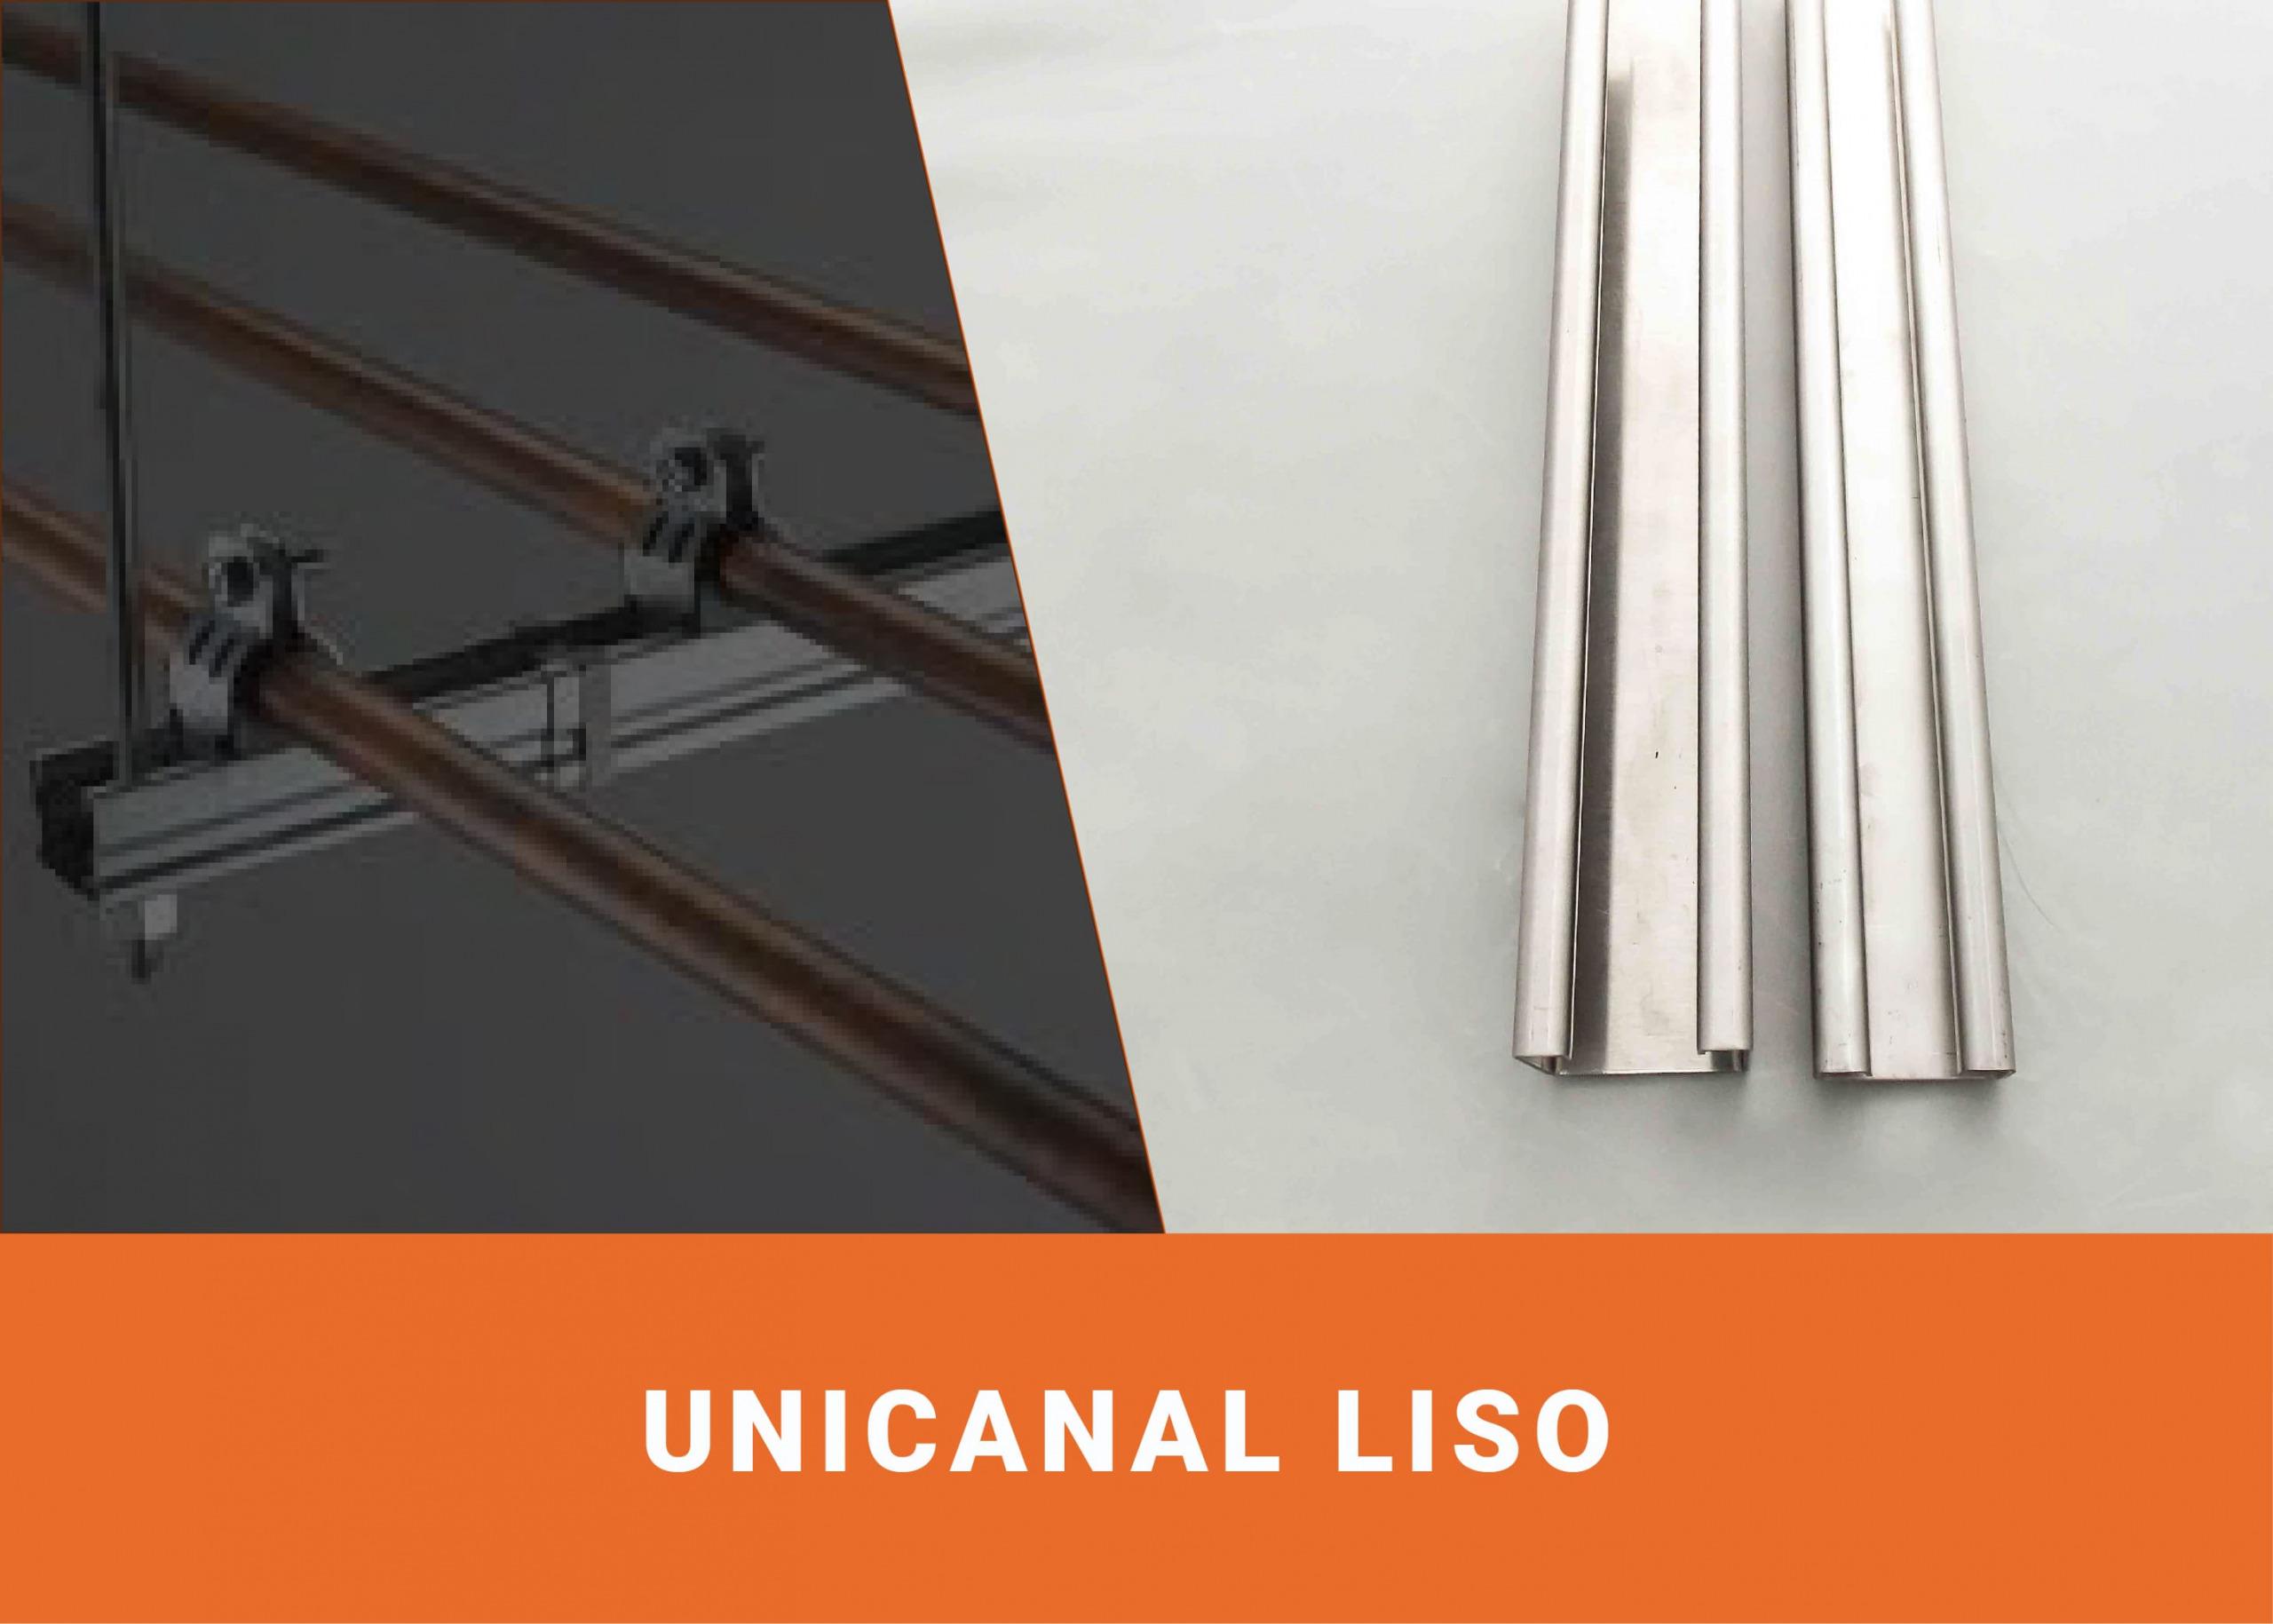 Unicanal 4x4/4x2 galvanizado liso Image